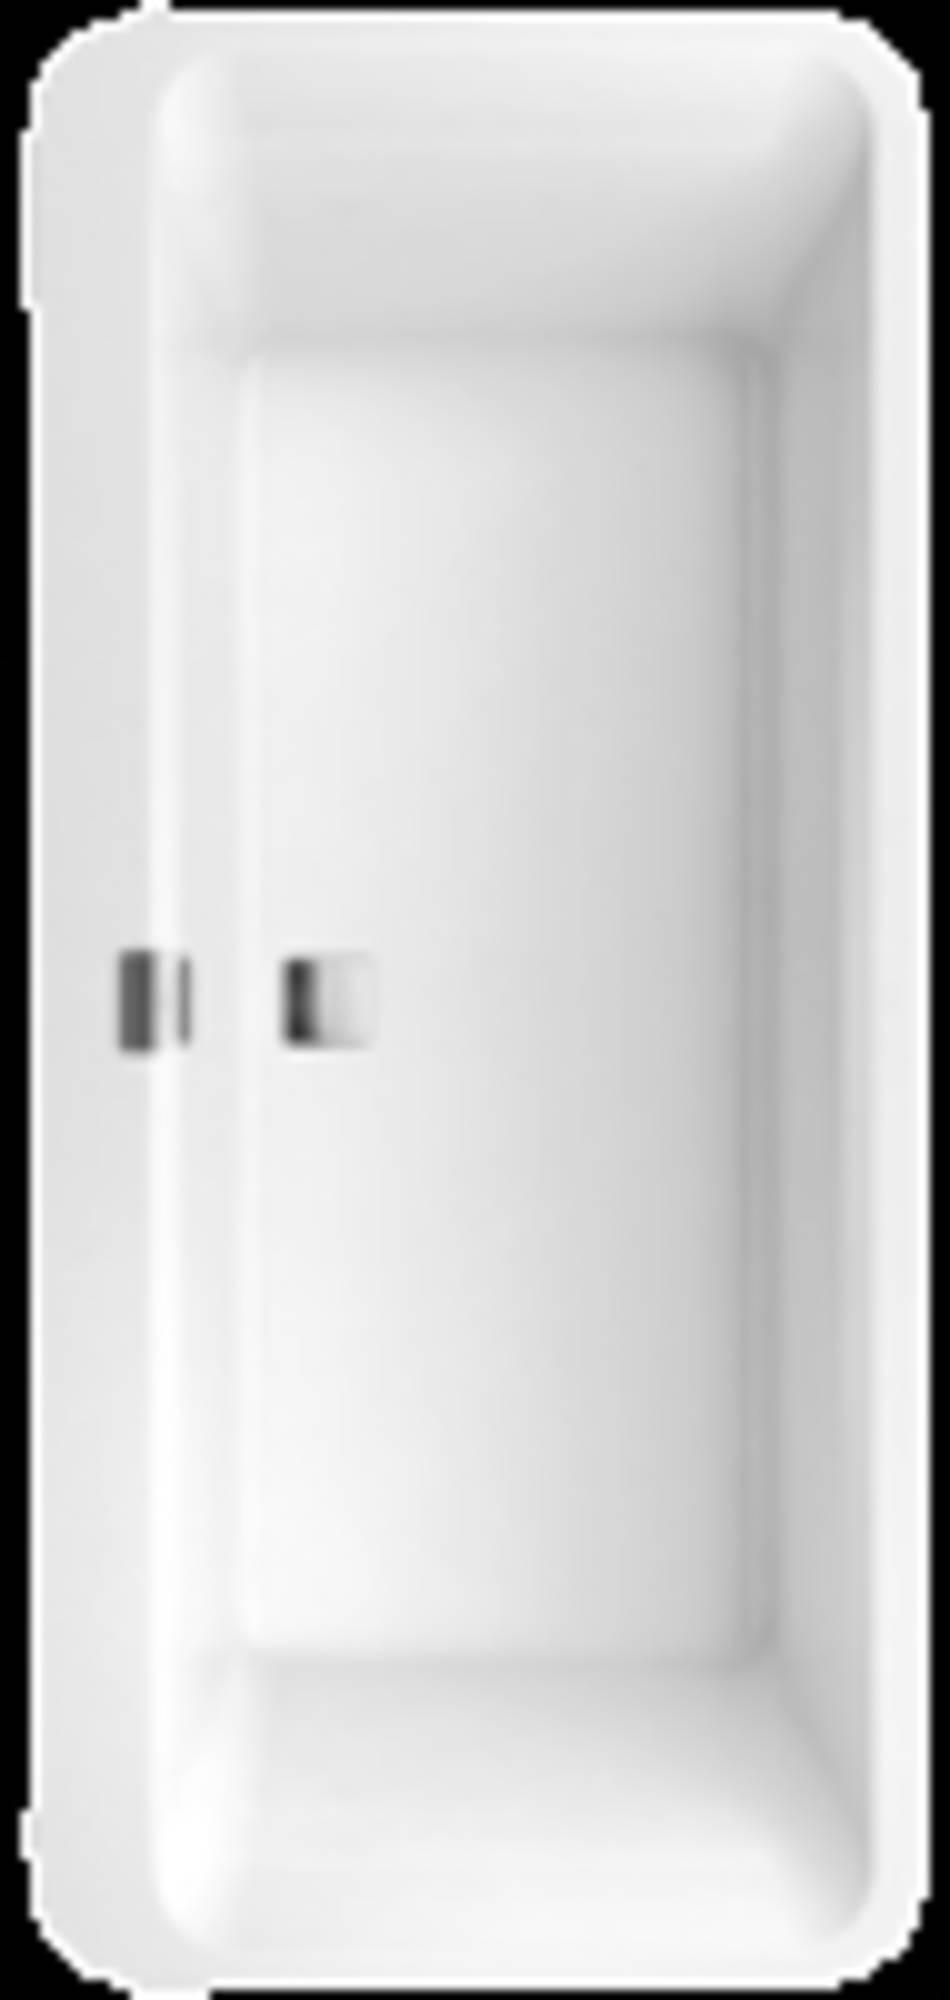 Villeroy&Boch Squaro Edge 12 bad vrijstaand ovaal 180x80cmmet badpanelen Star White